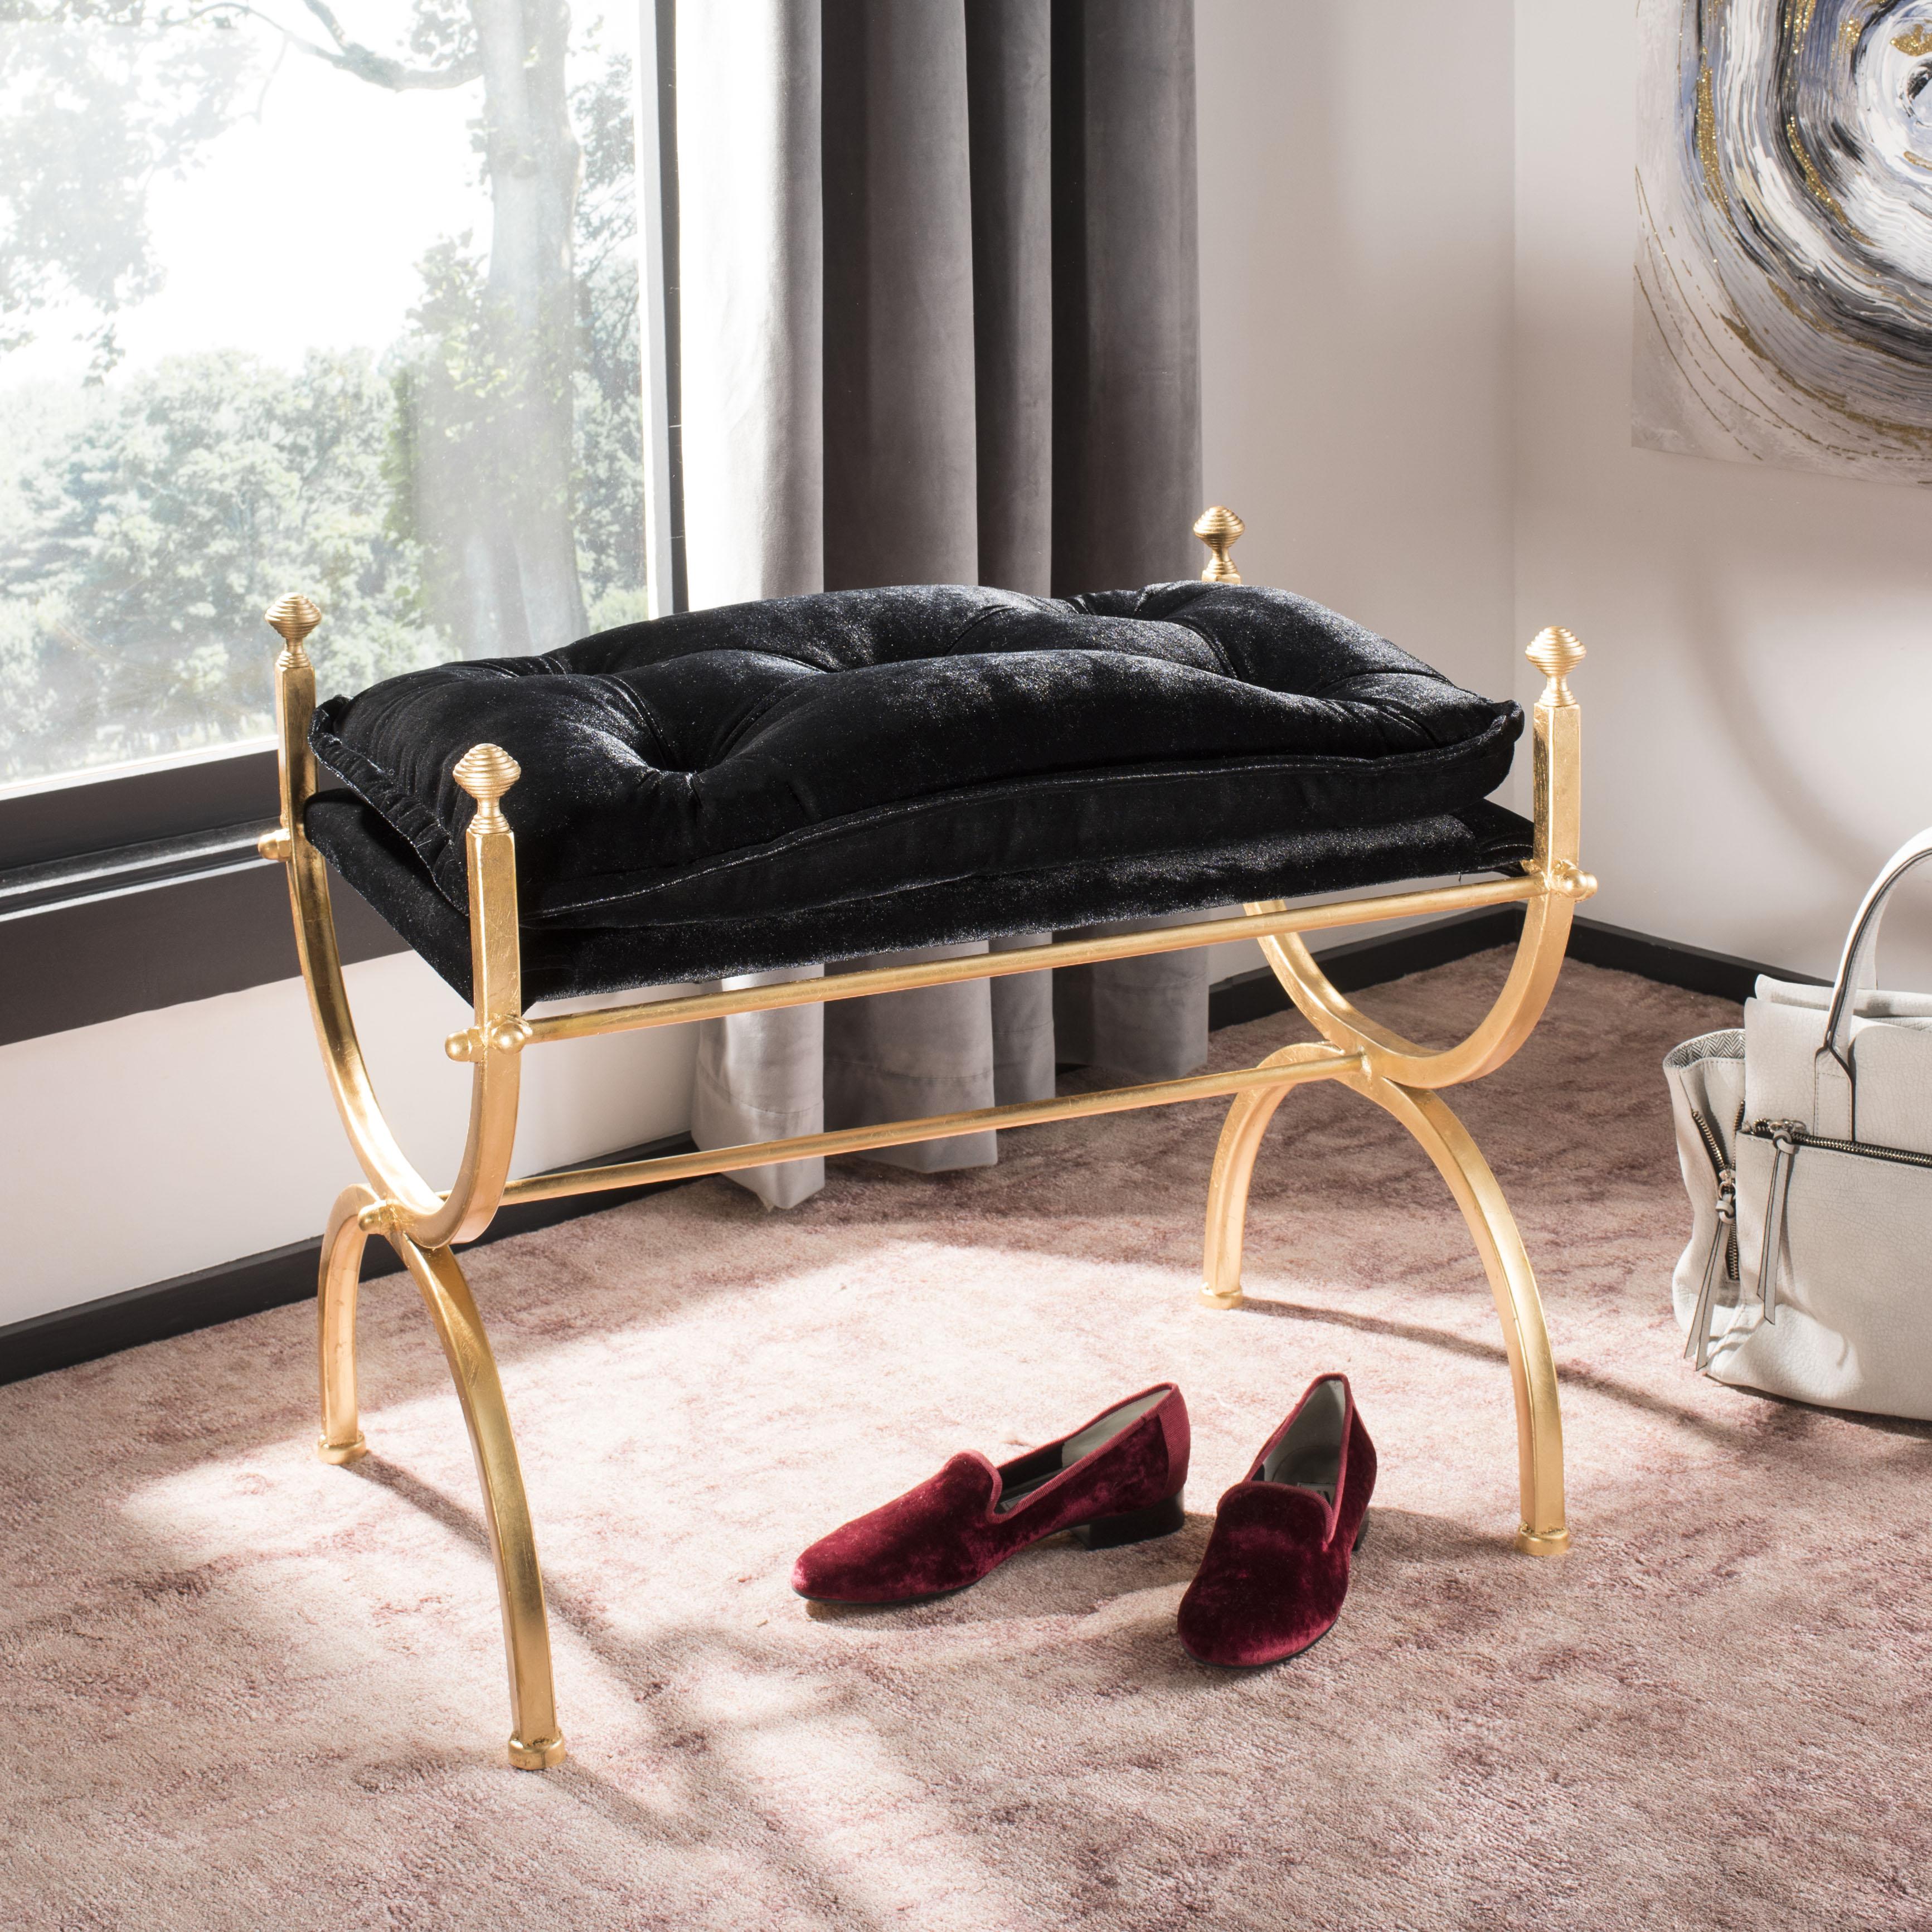 Safavieh Jasmine Modern Glam Tufted Bench, Black/Gold Foil